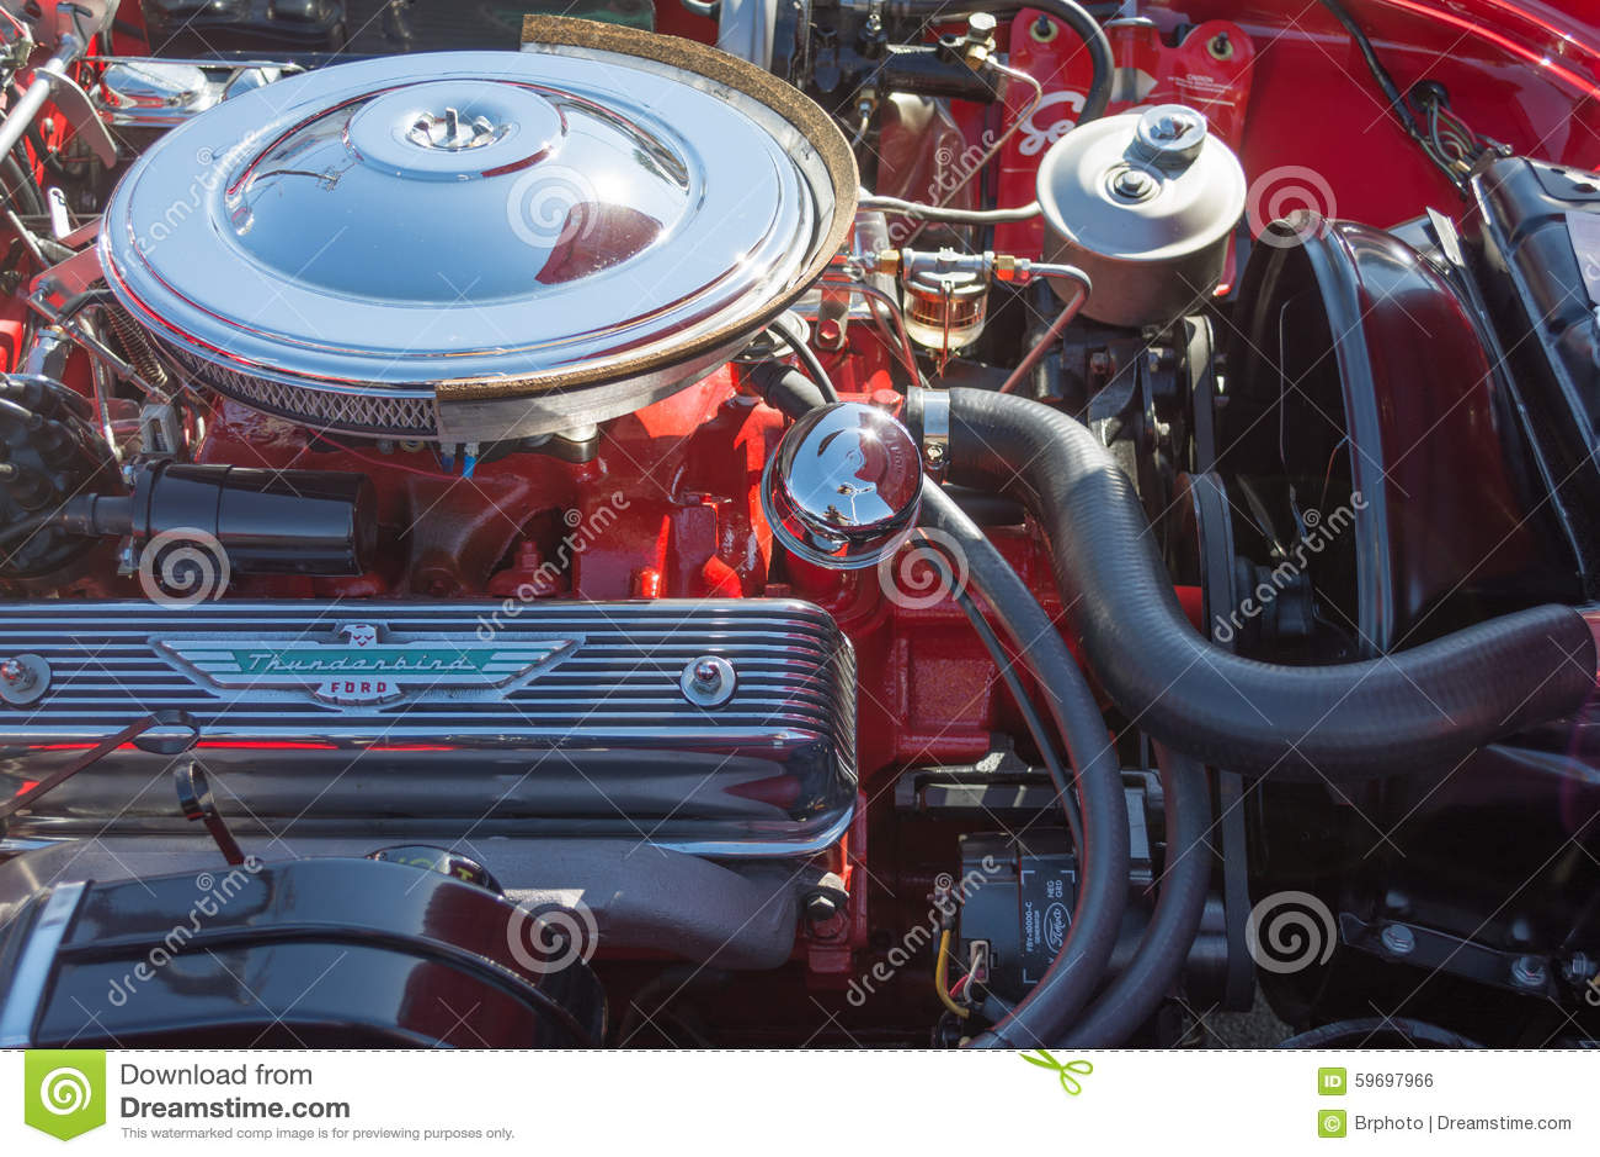 Ford Thunderbird Engine On Display Editorial Photo Image